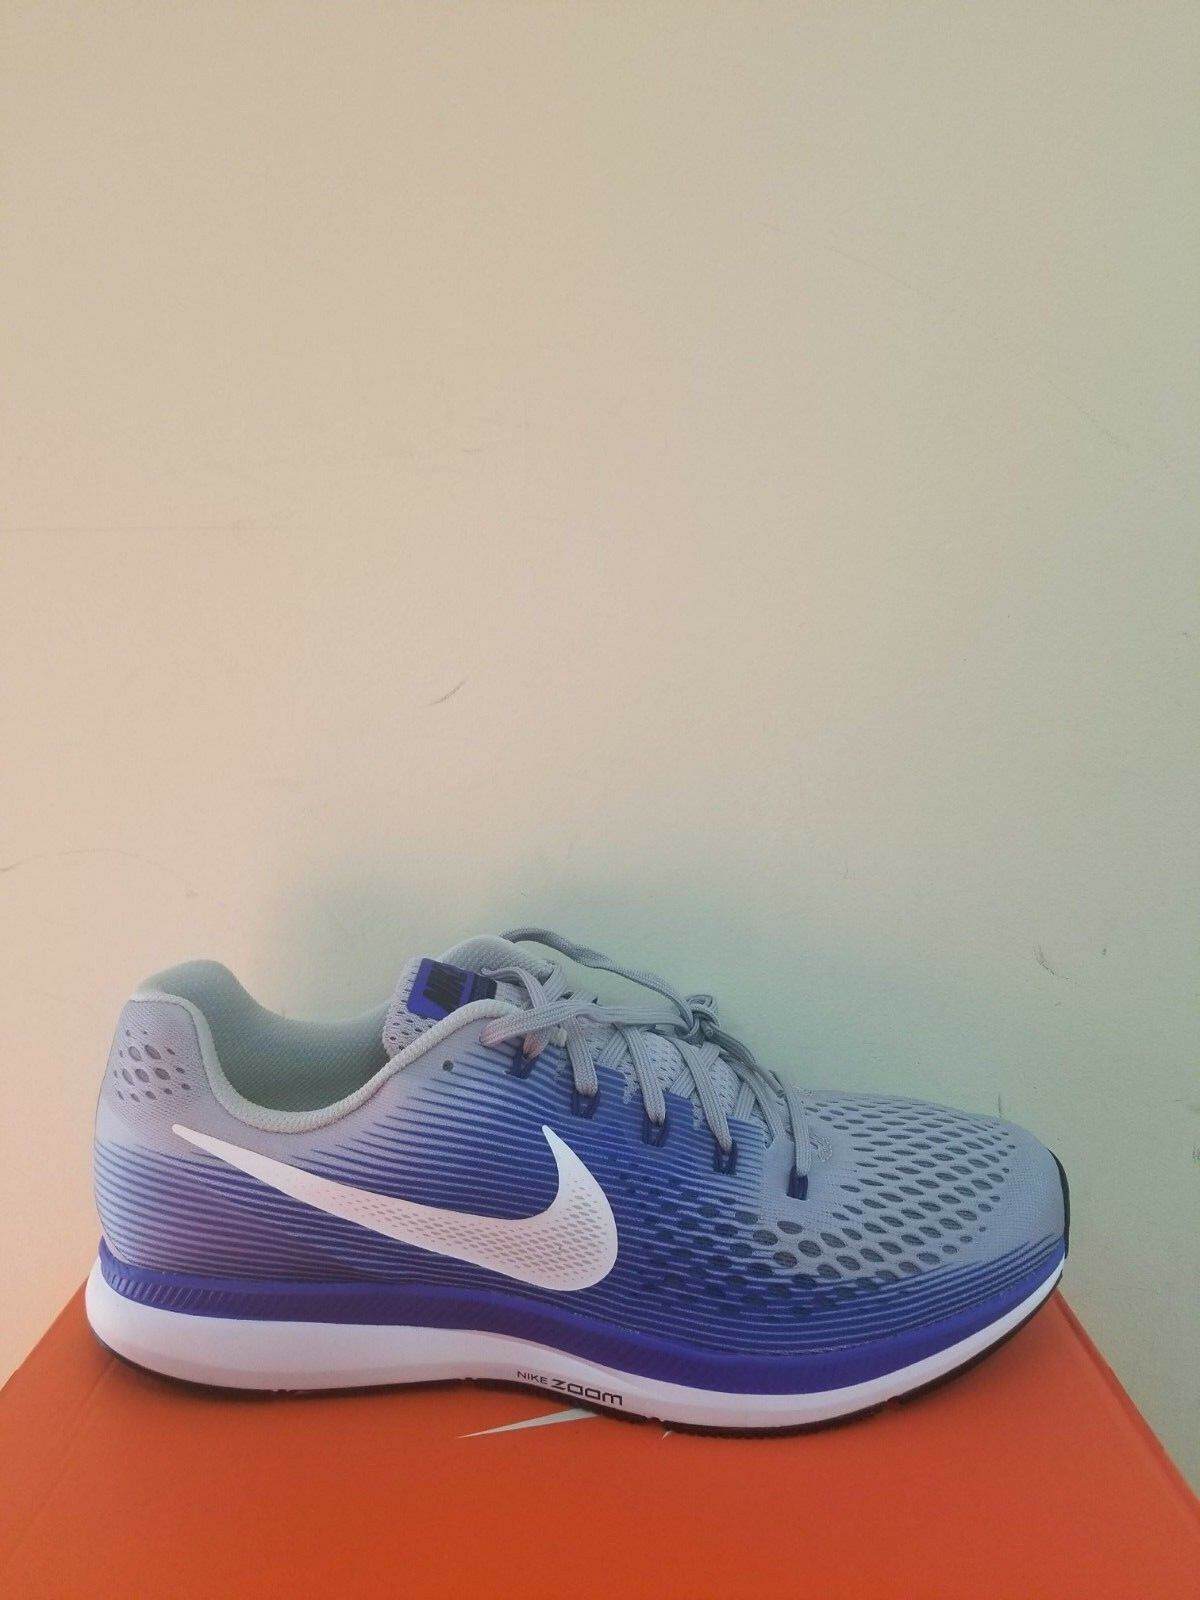 New Nike Men's Air Zoom Pegasus 34  Running shoes Size 13 NIB